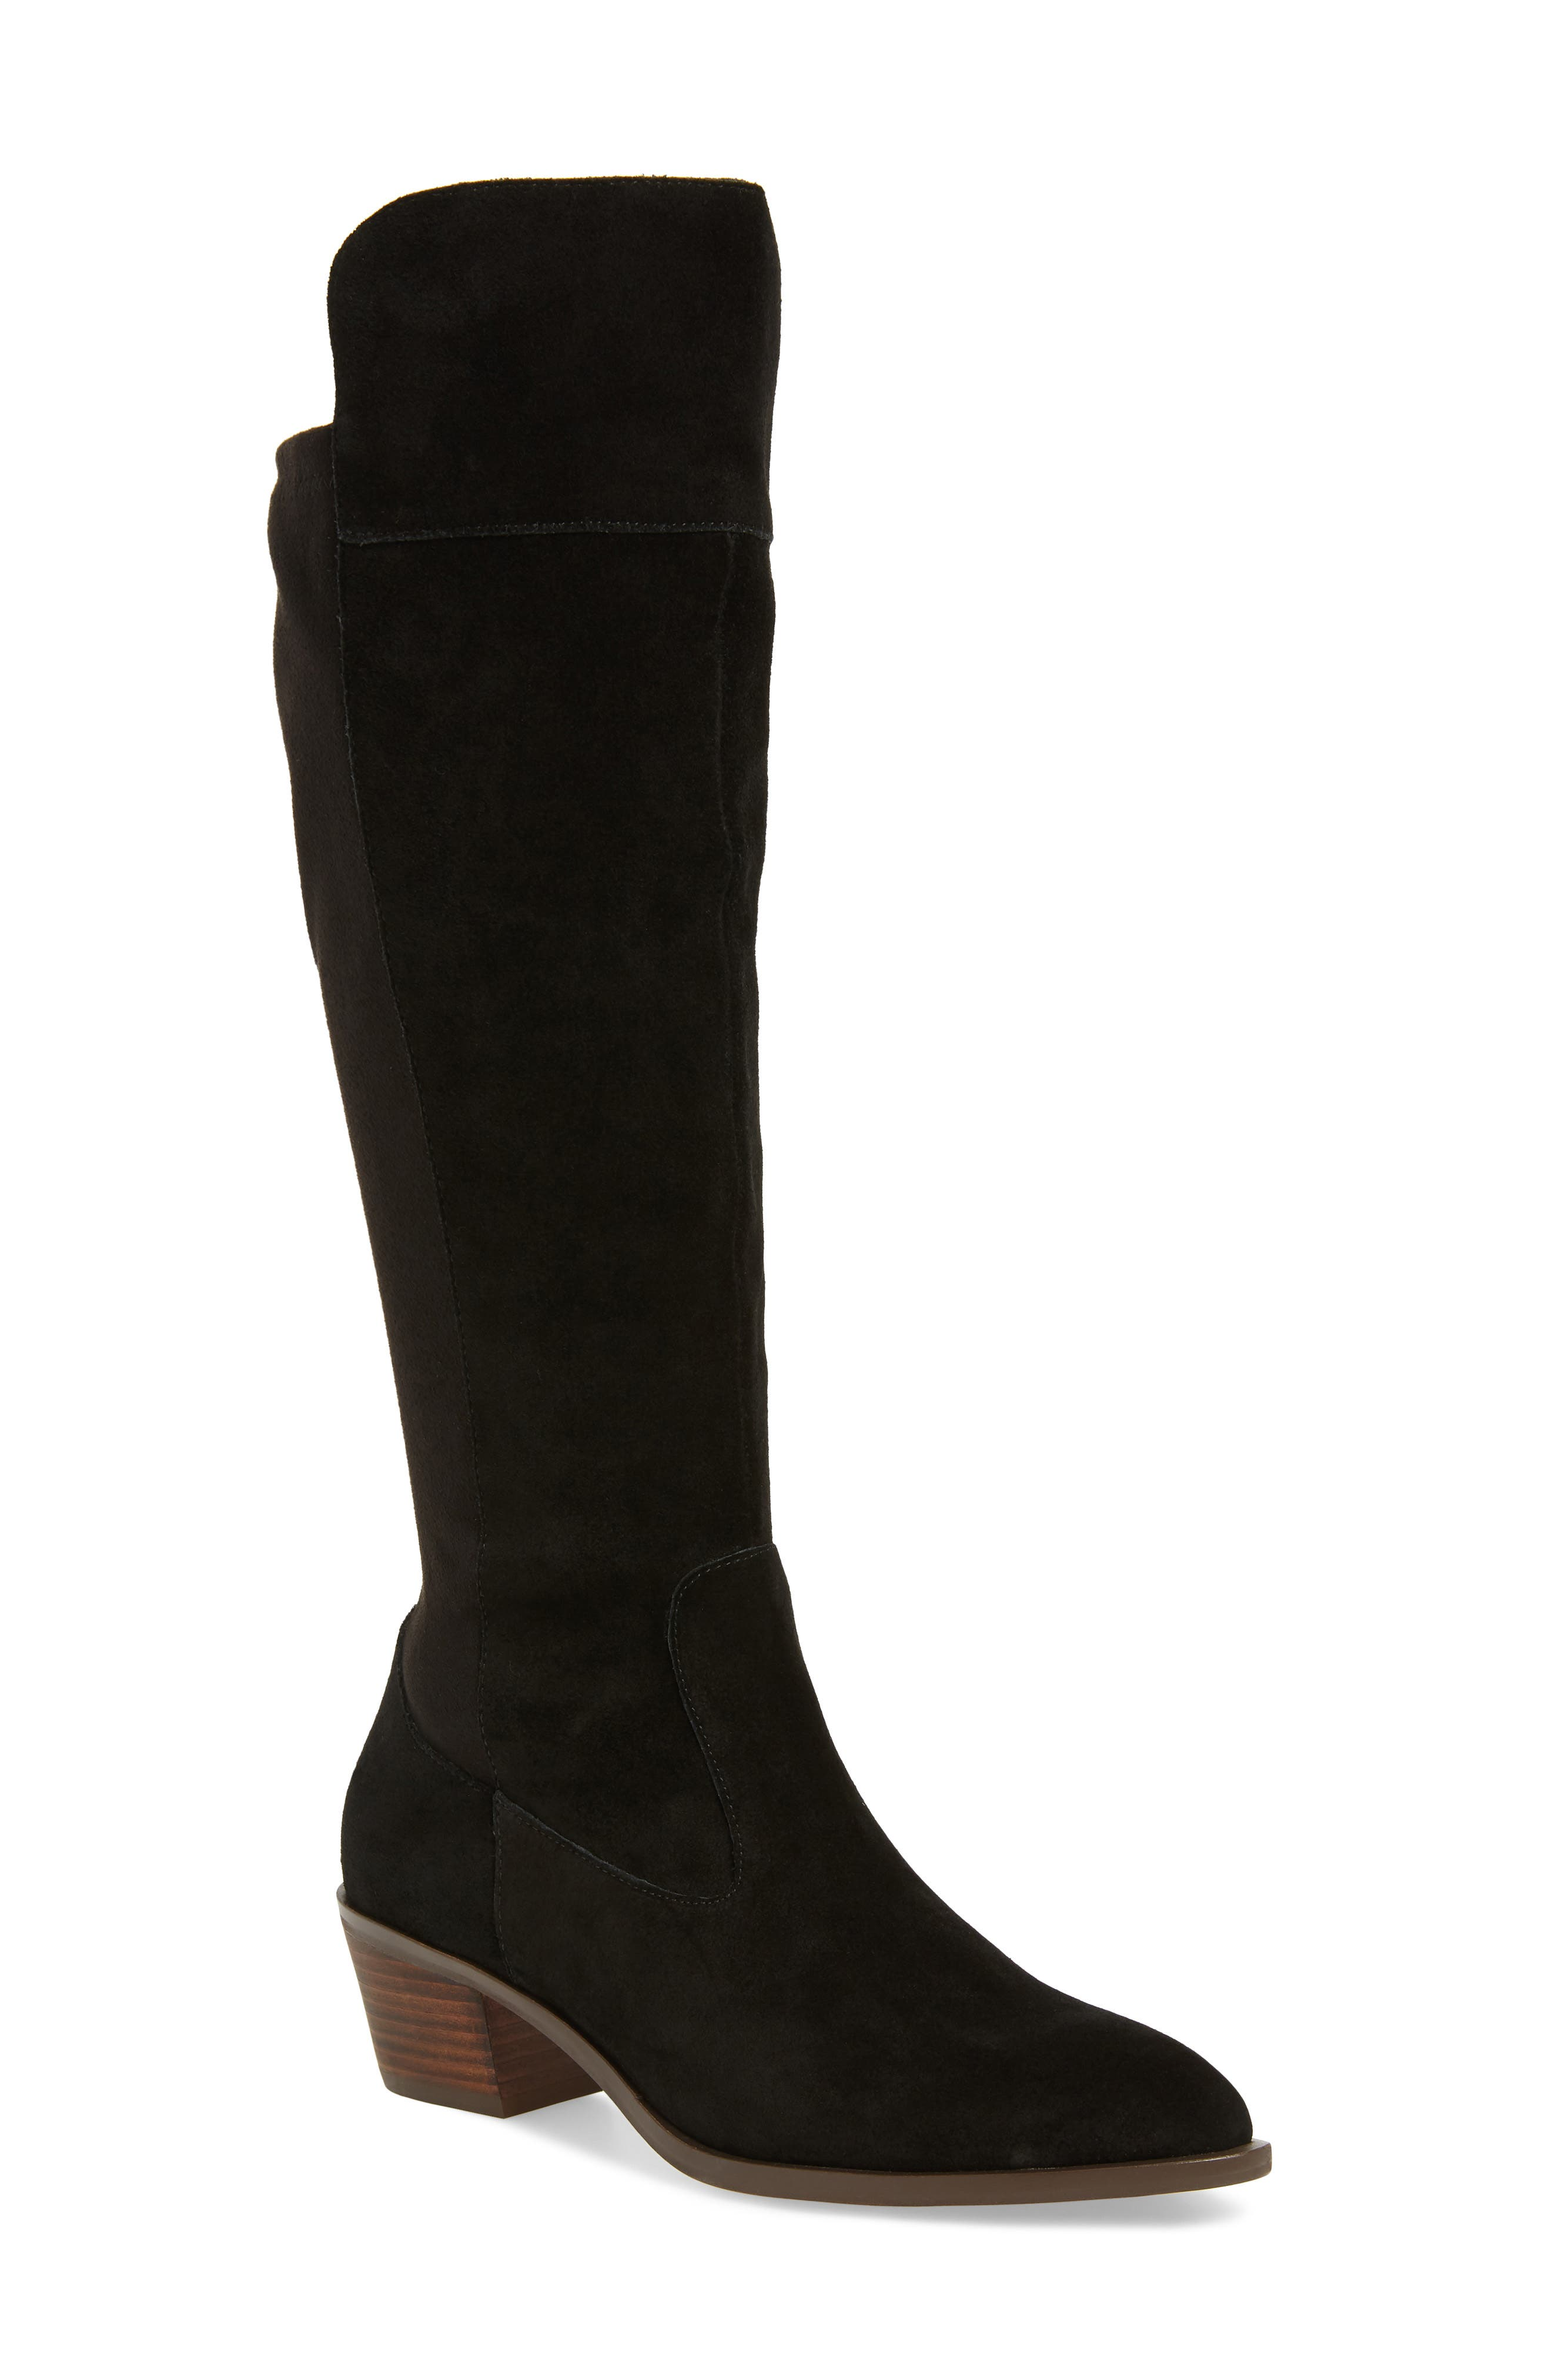 Noamie Knee High Boot,                         Main,                         color, BLACK SUEDE